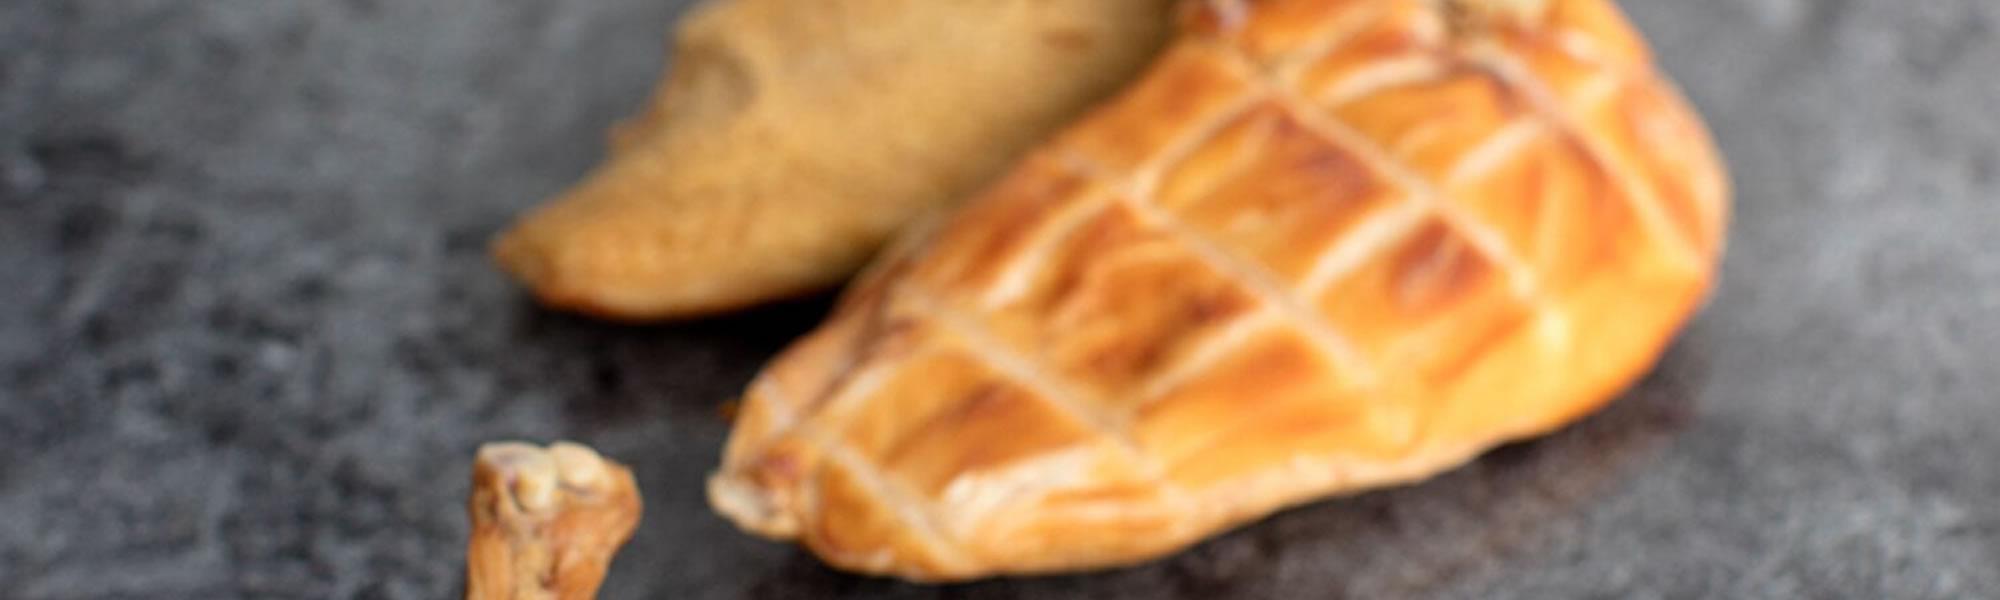 banner-smoked-chicken